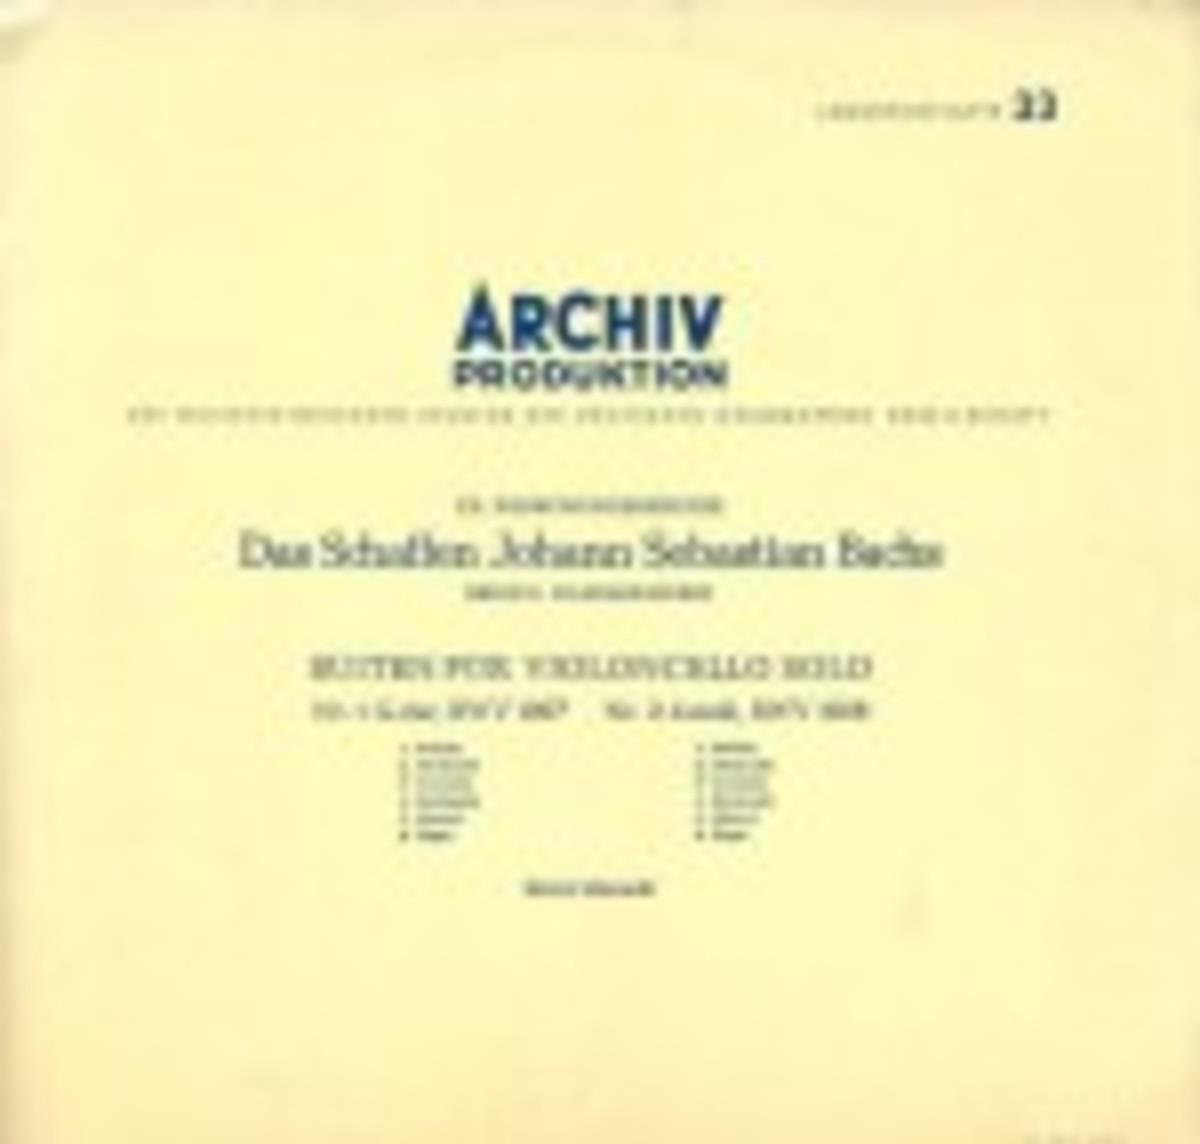 archiv-bachs